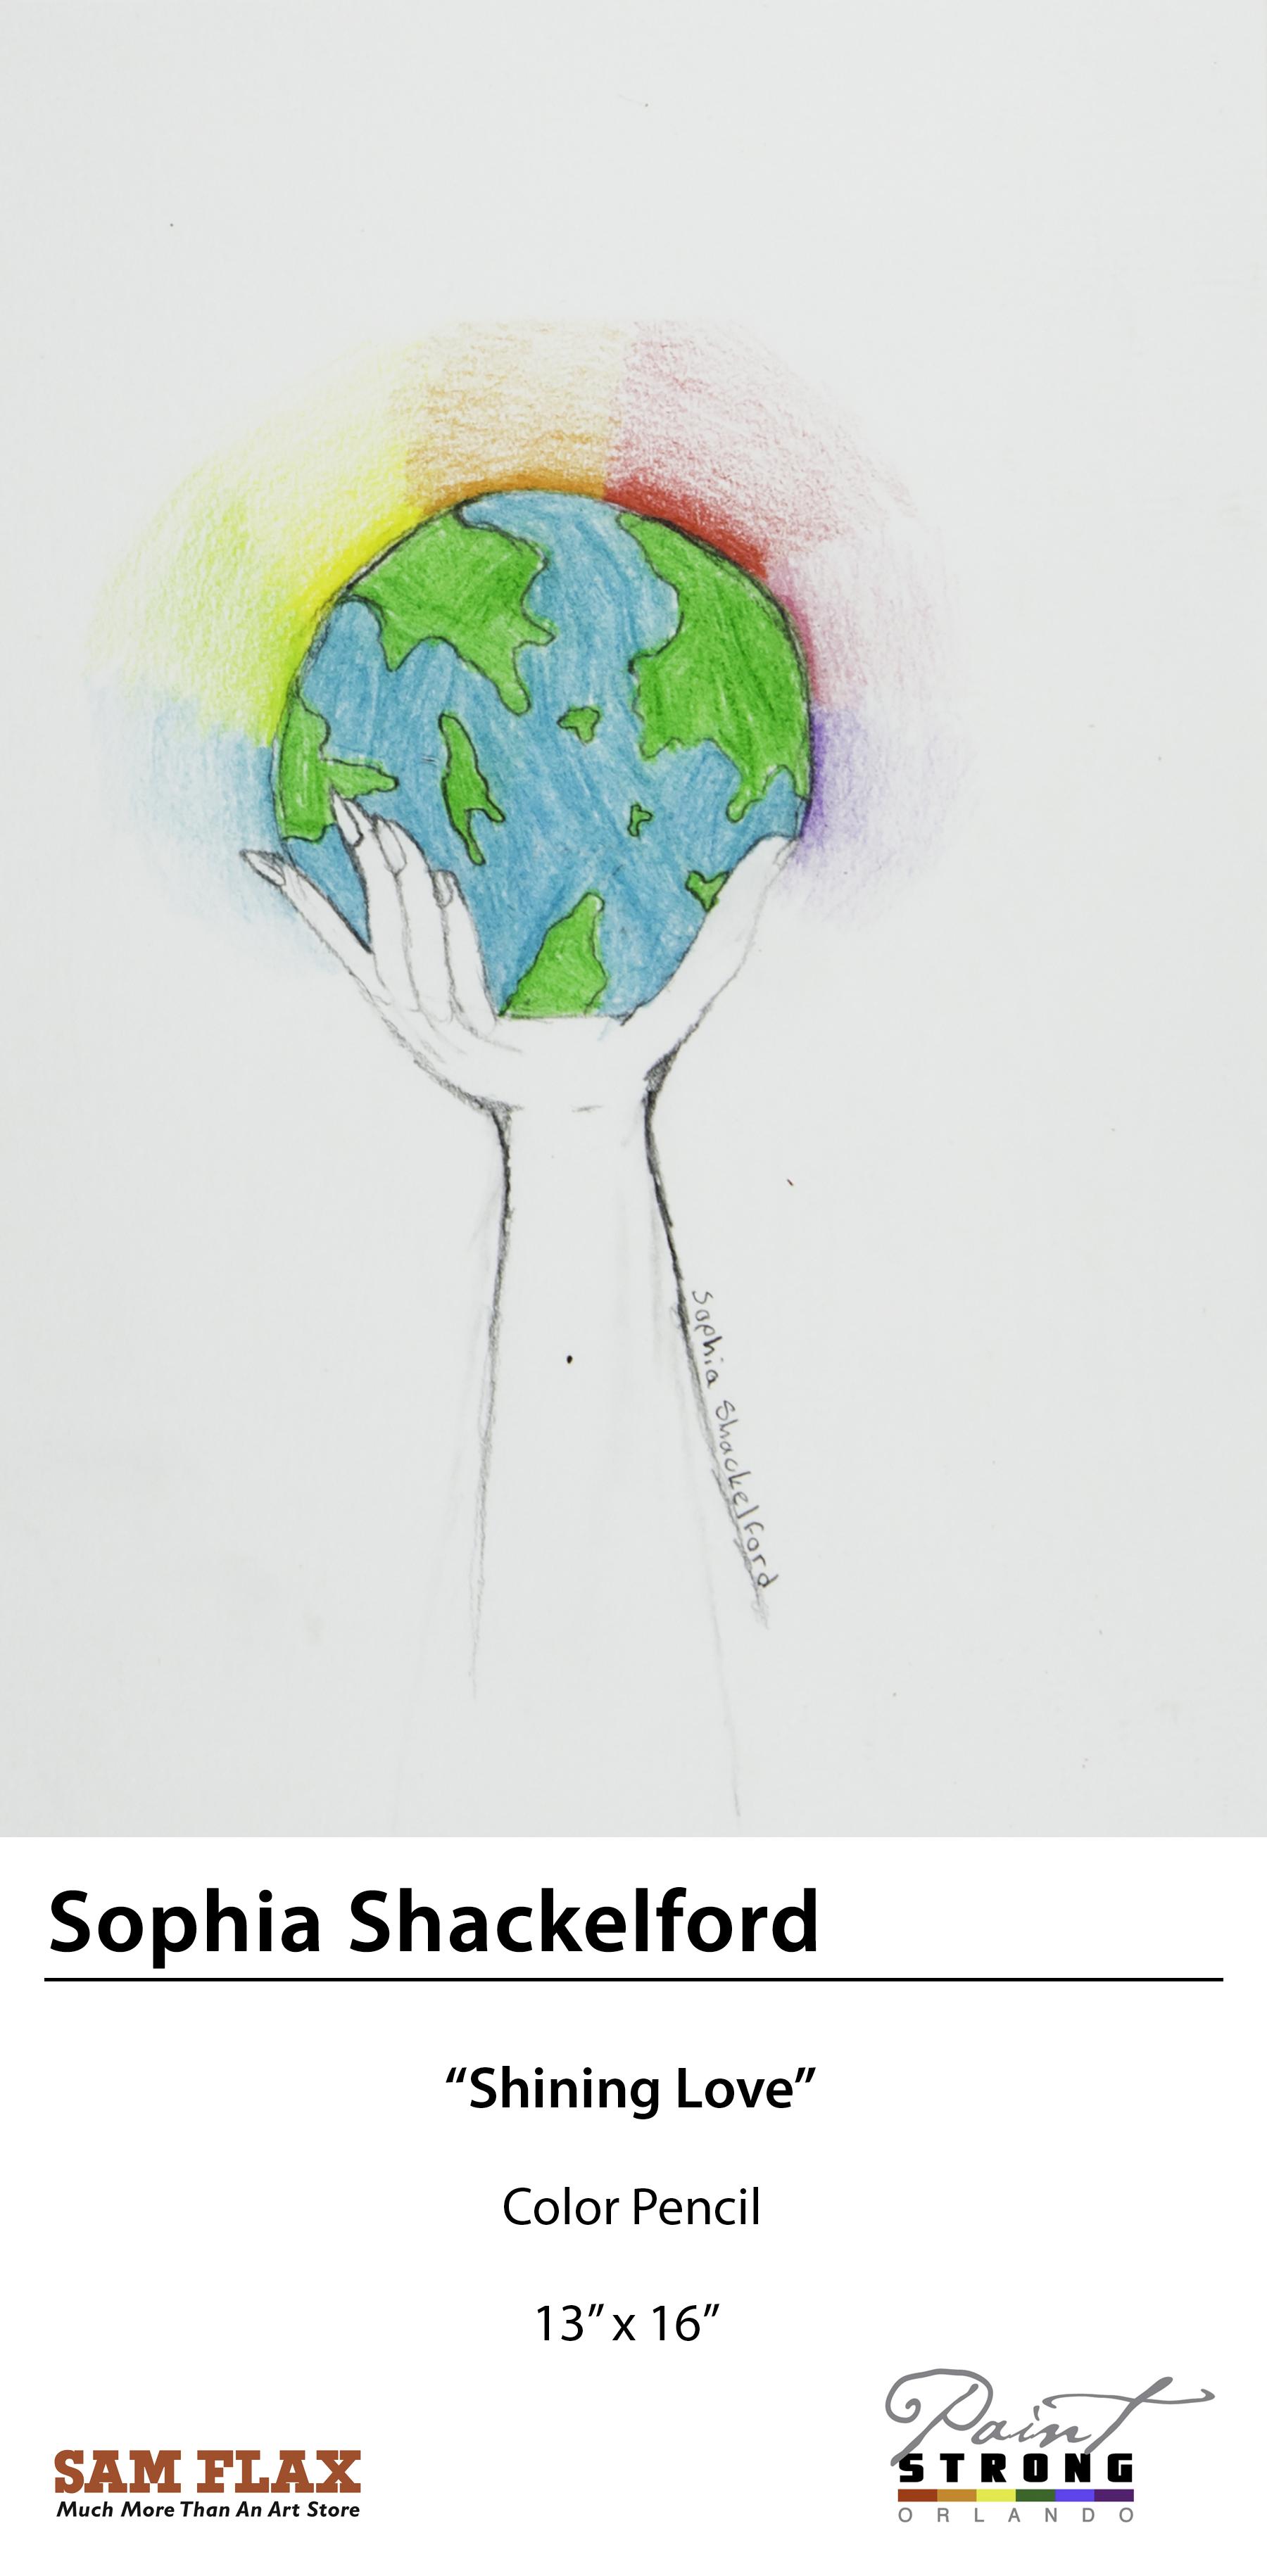 Sophia Shackelford